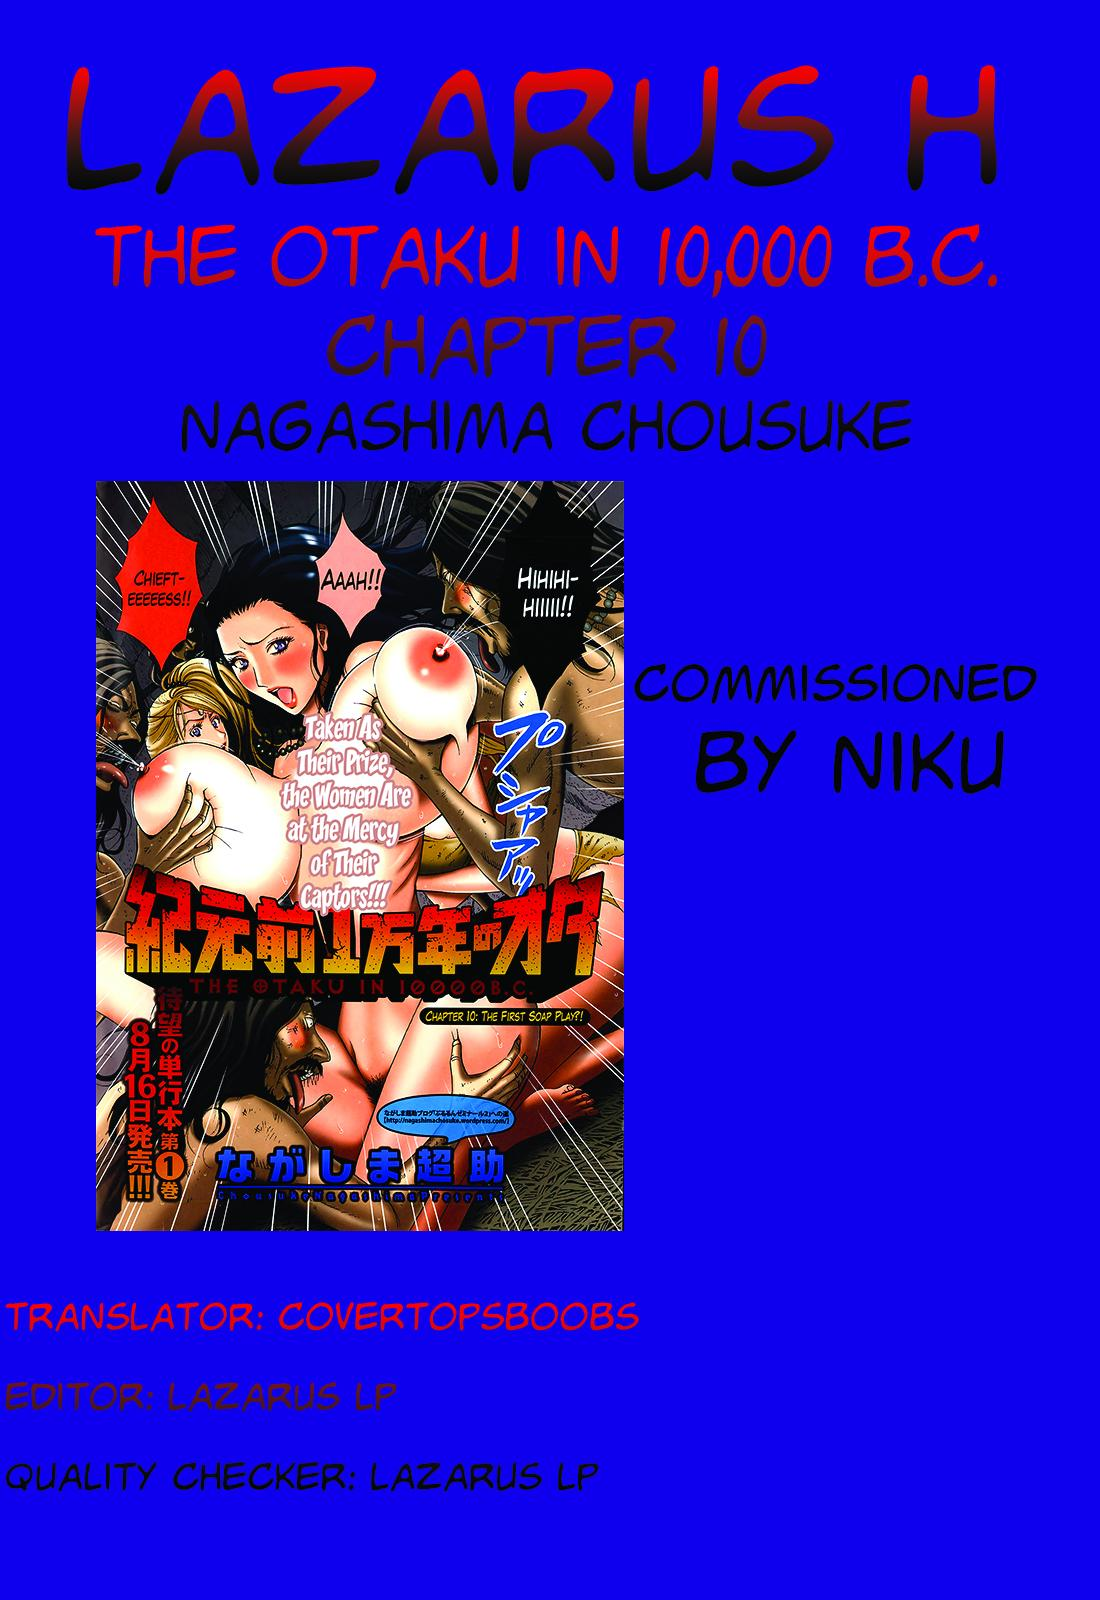 Kigenzen 10000 Nen no Ota | The Otaku in 10,000 B.C. 195